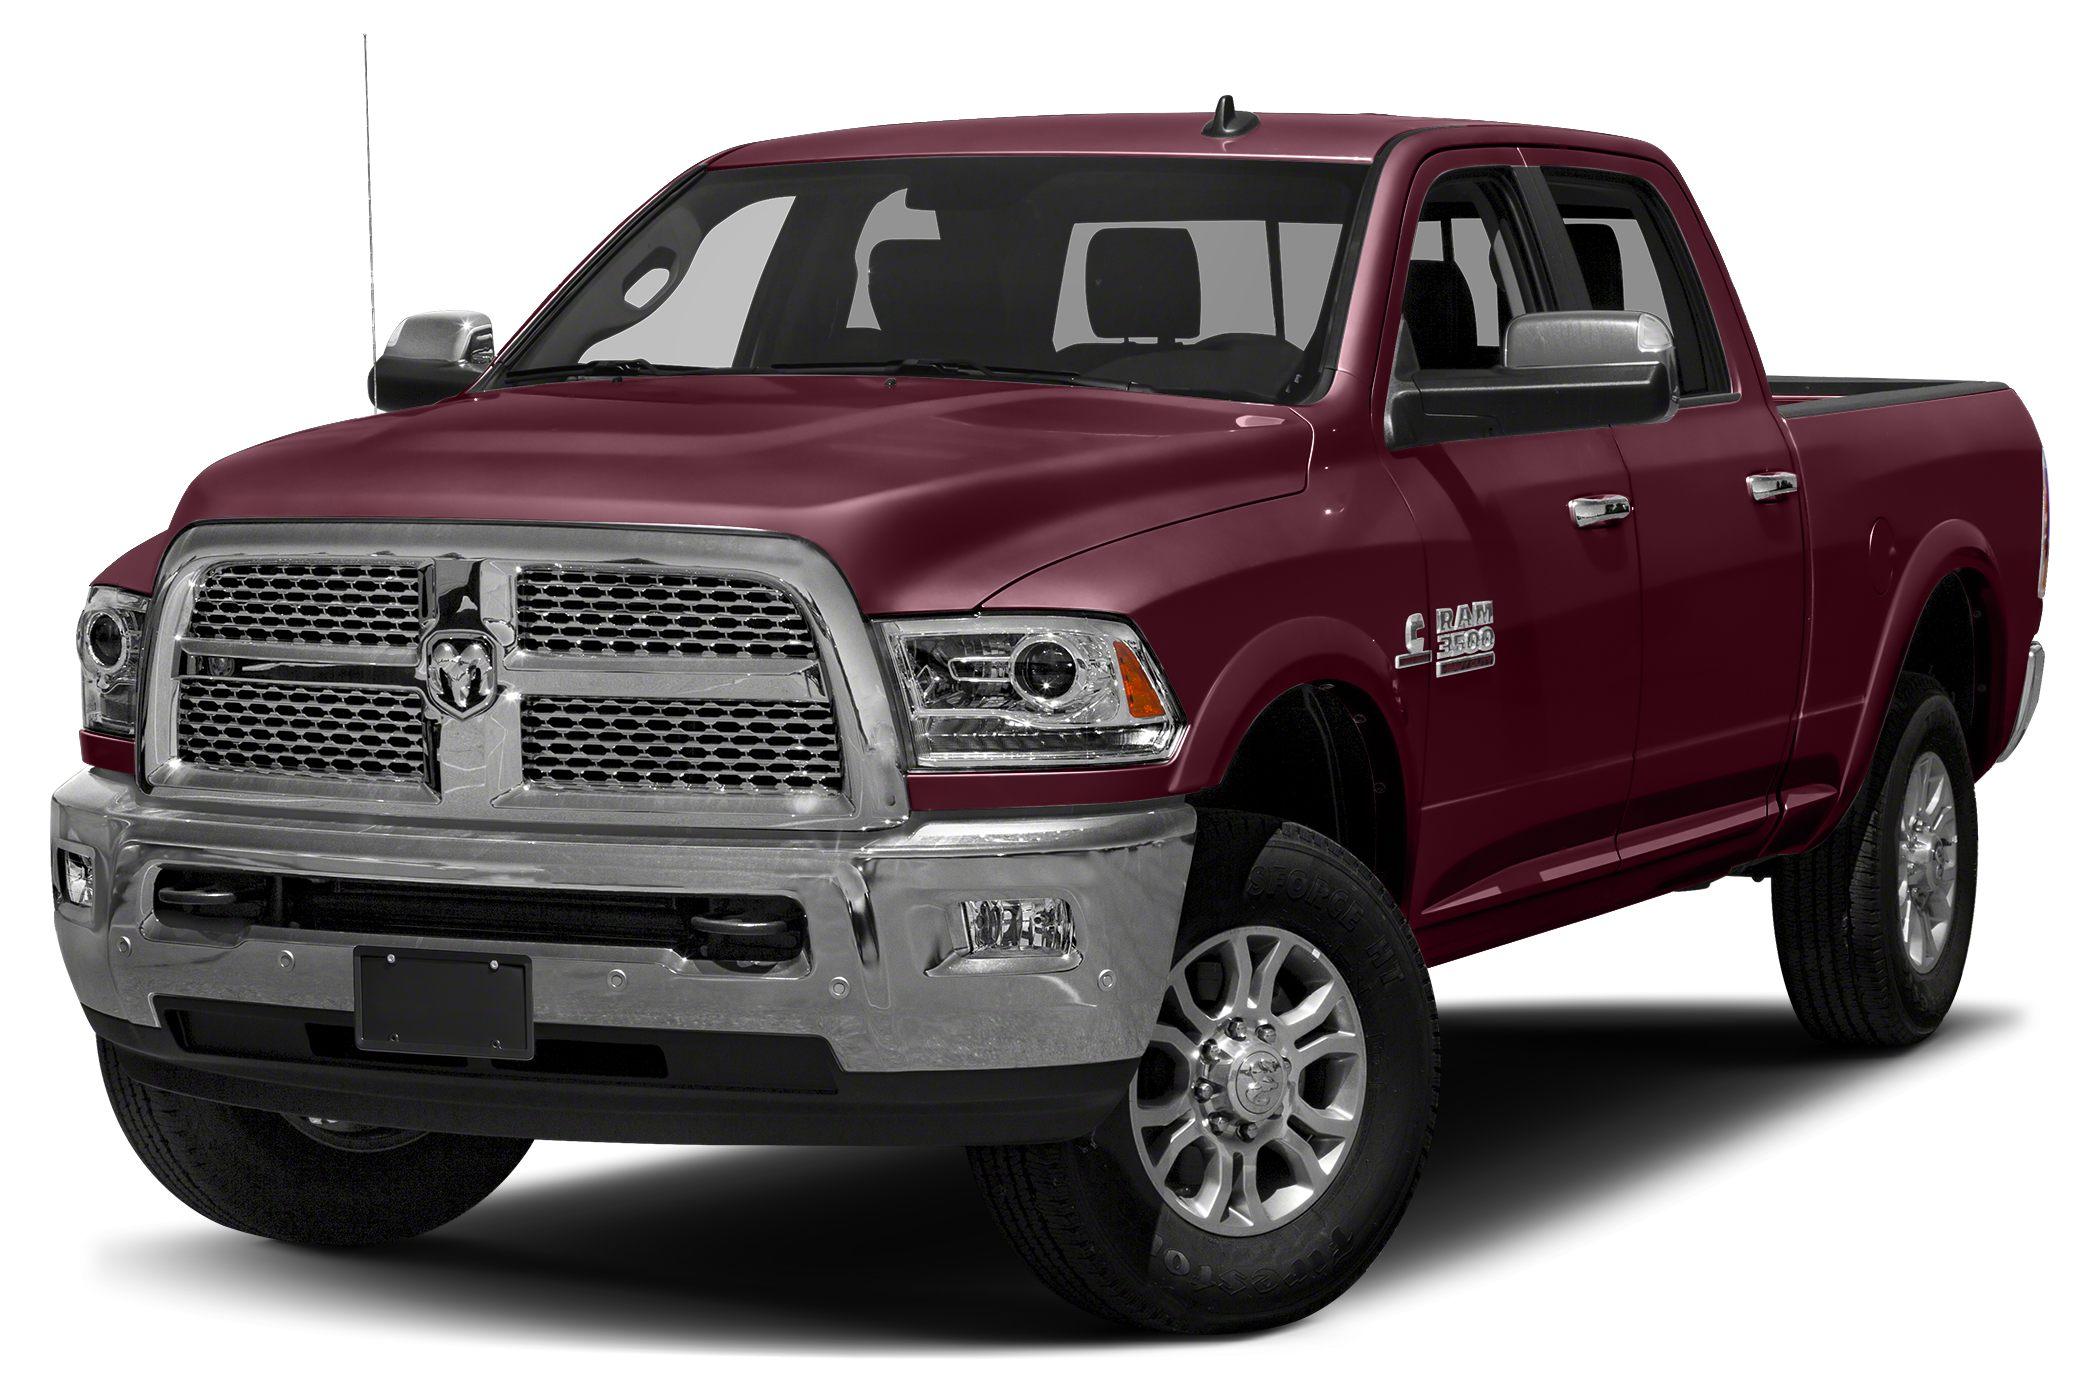 2017 RAM 3500 Laramie Longhorn HeatedCooled Leather Seats NAV Turbo Alloy Wheels Bed Liner 4